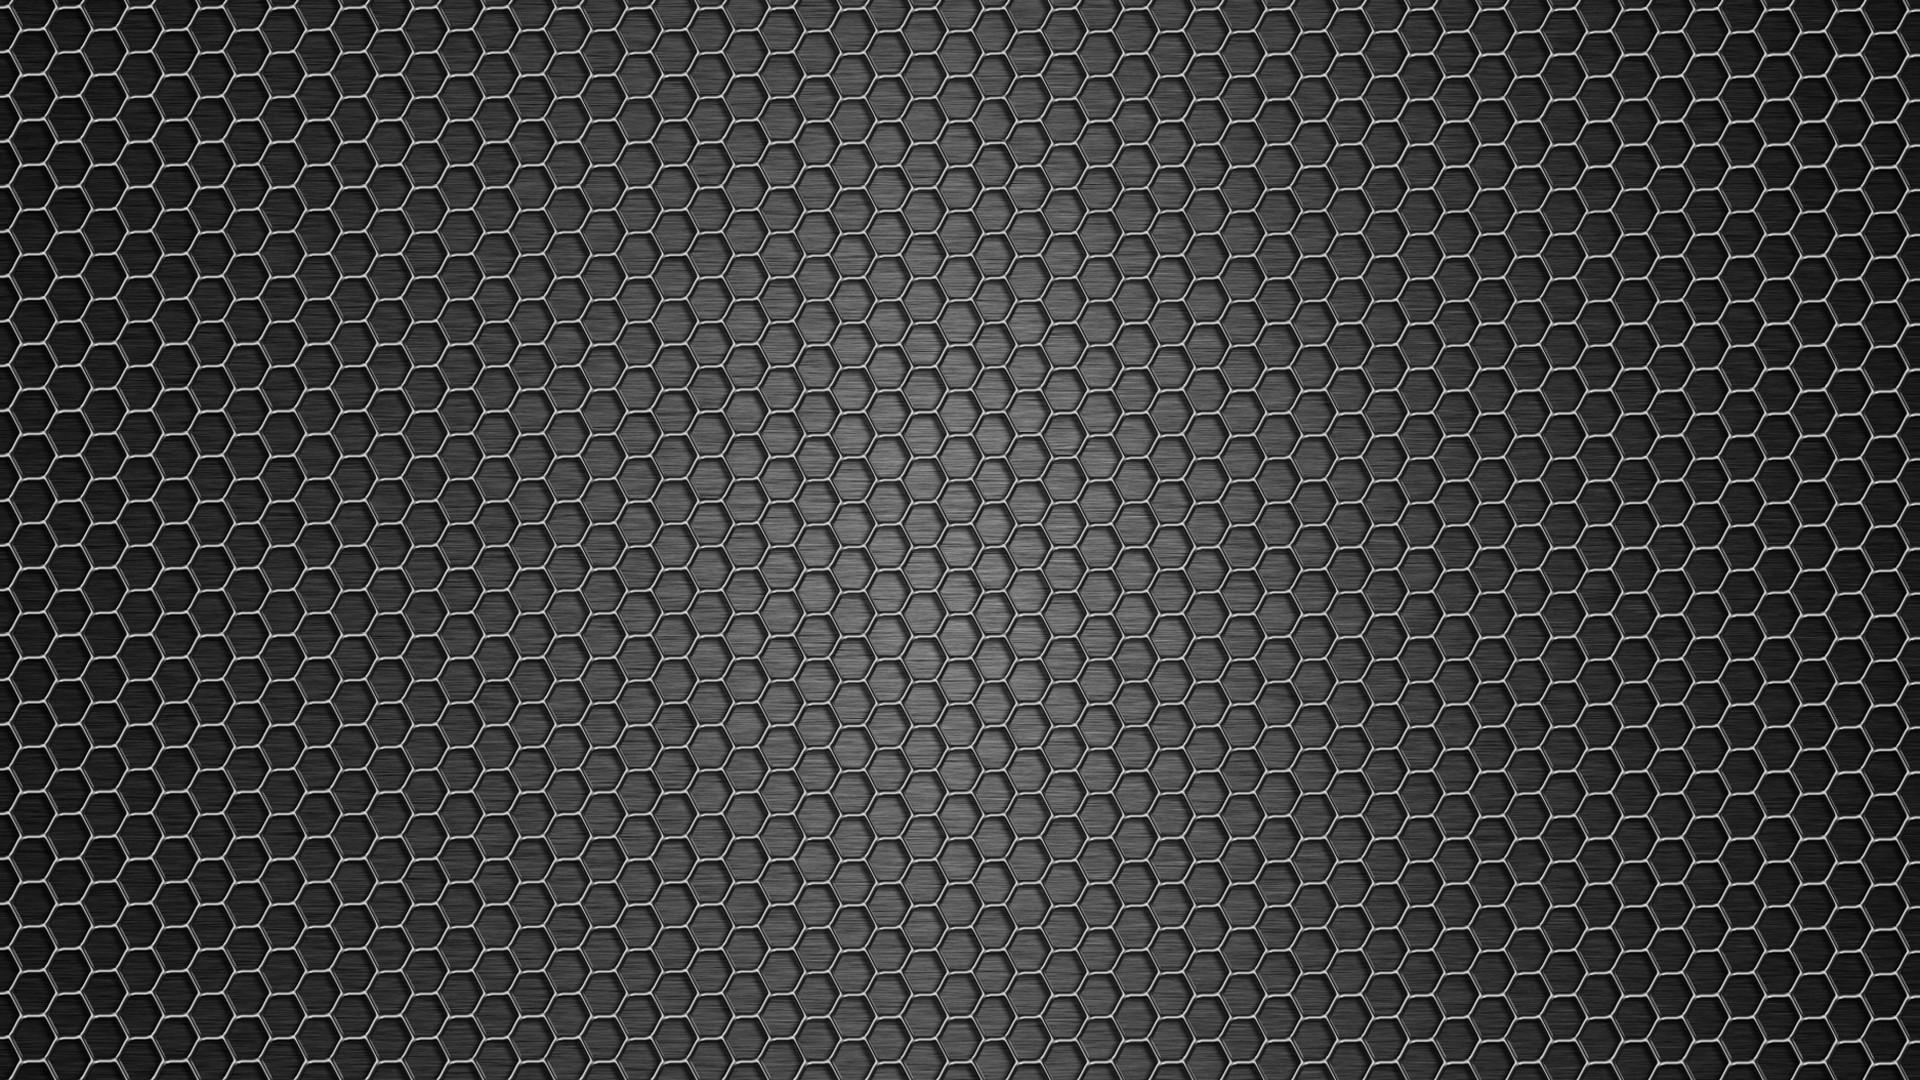 Unduh 900 Wallpaper Black Metal Hd  Paling Baru